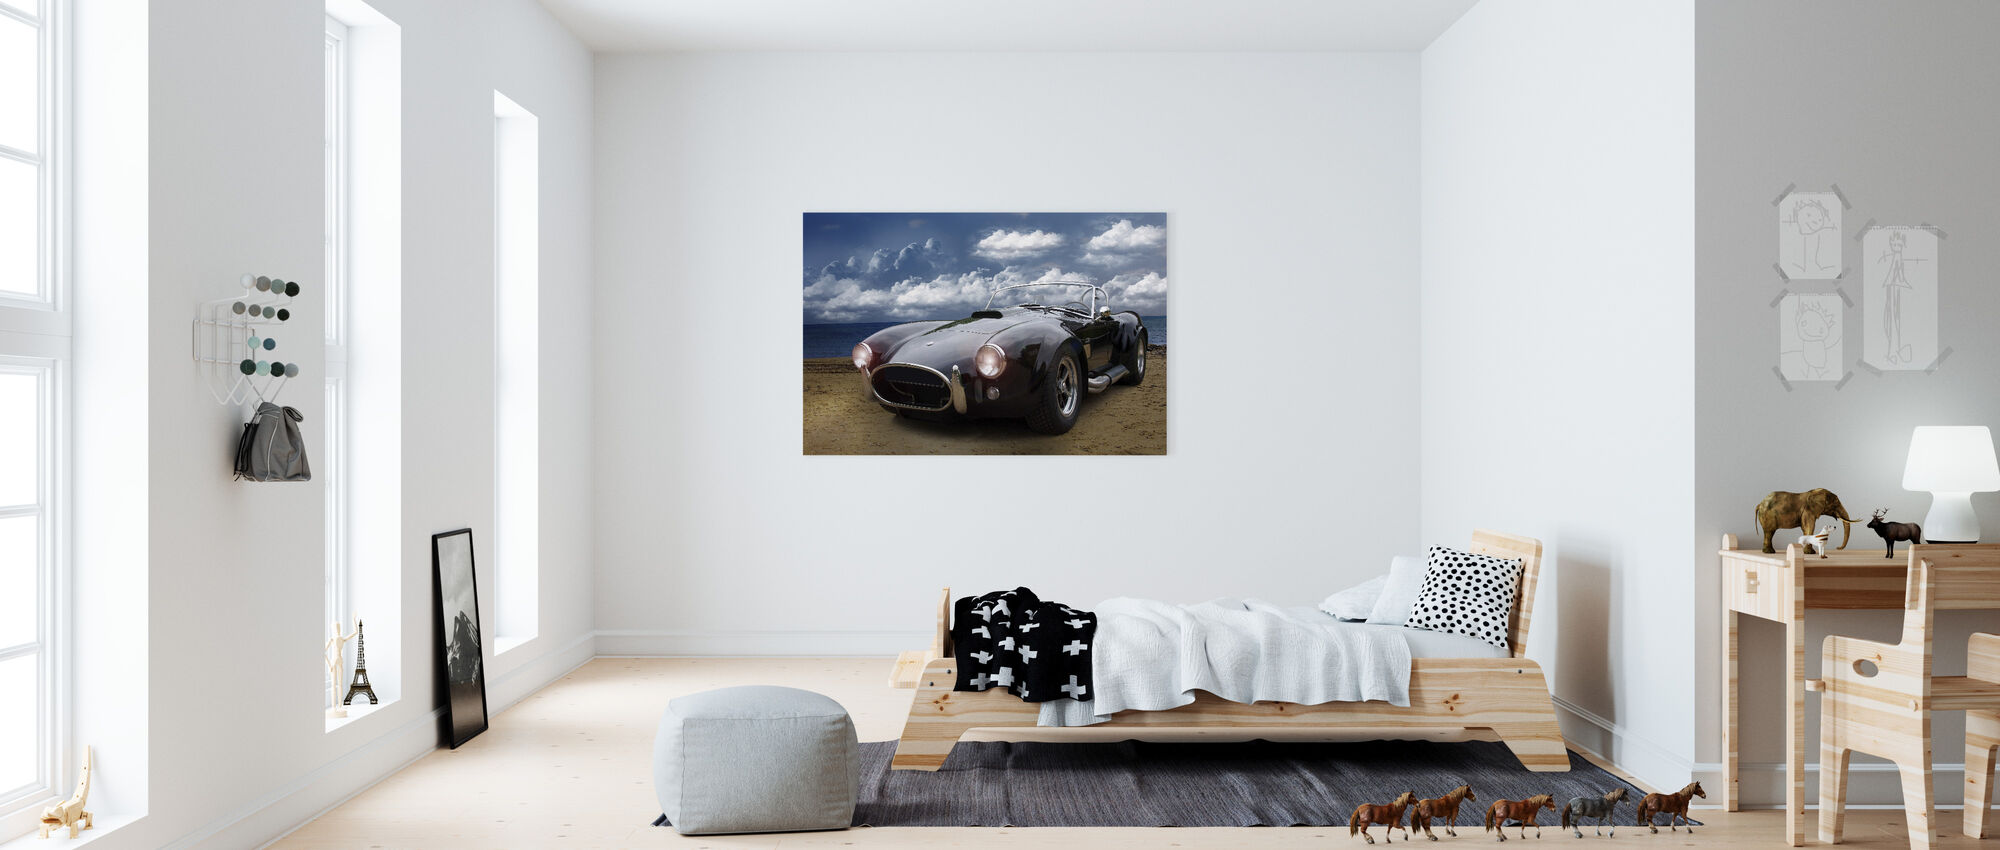 Classic Vintage Car - Canvastaulu - Lastenhuone